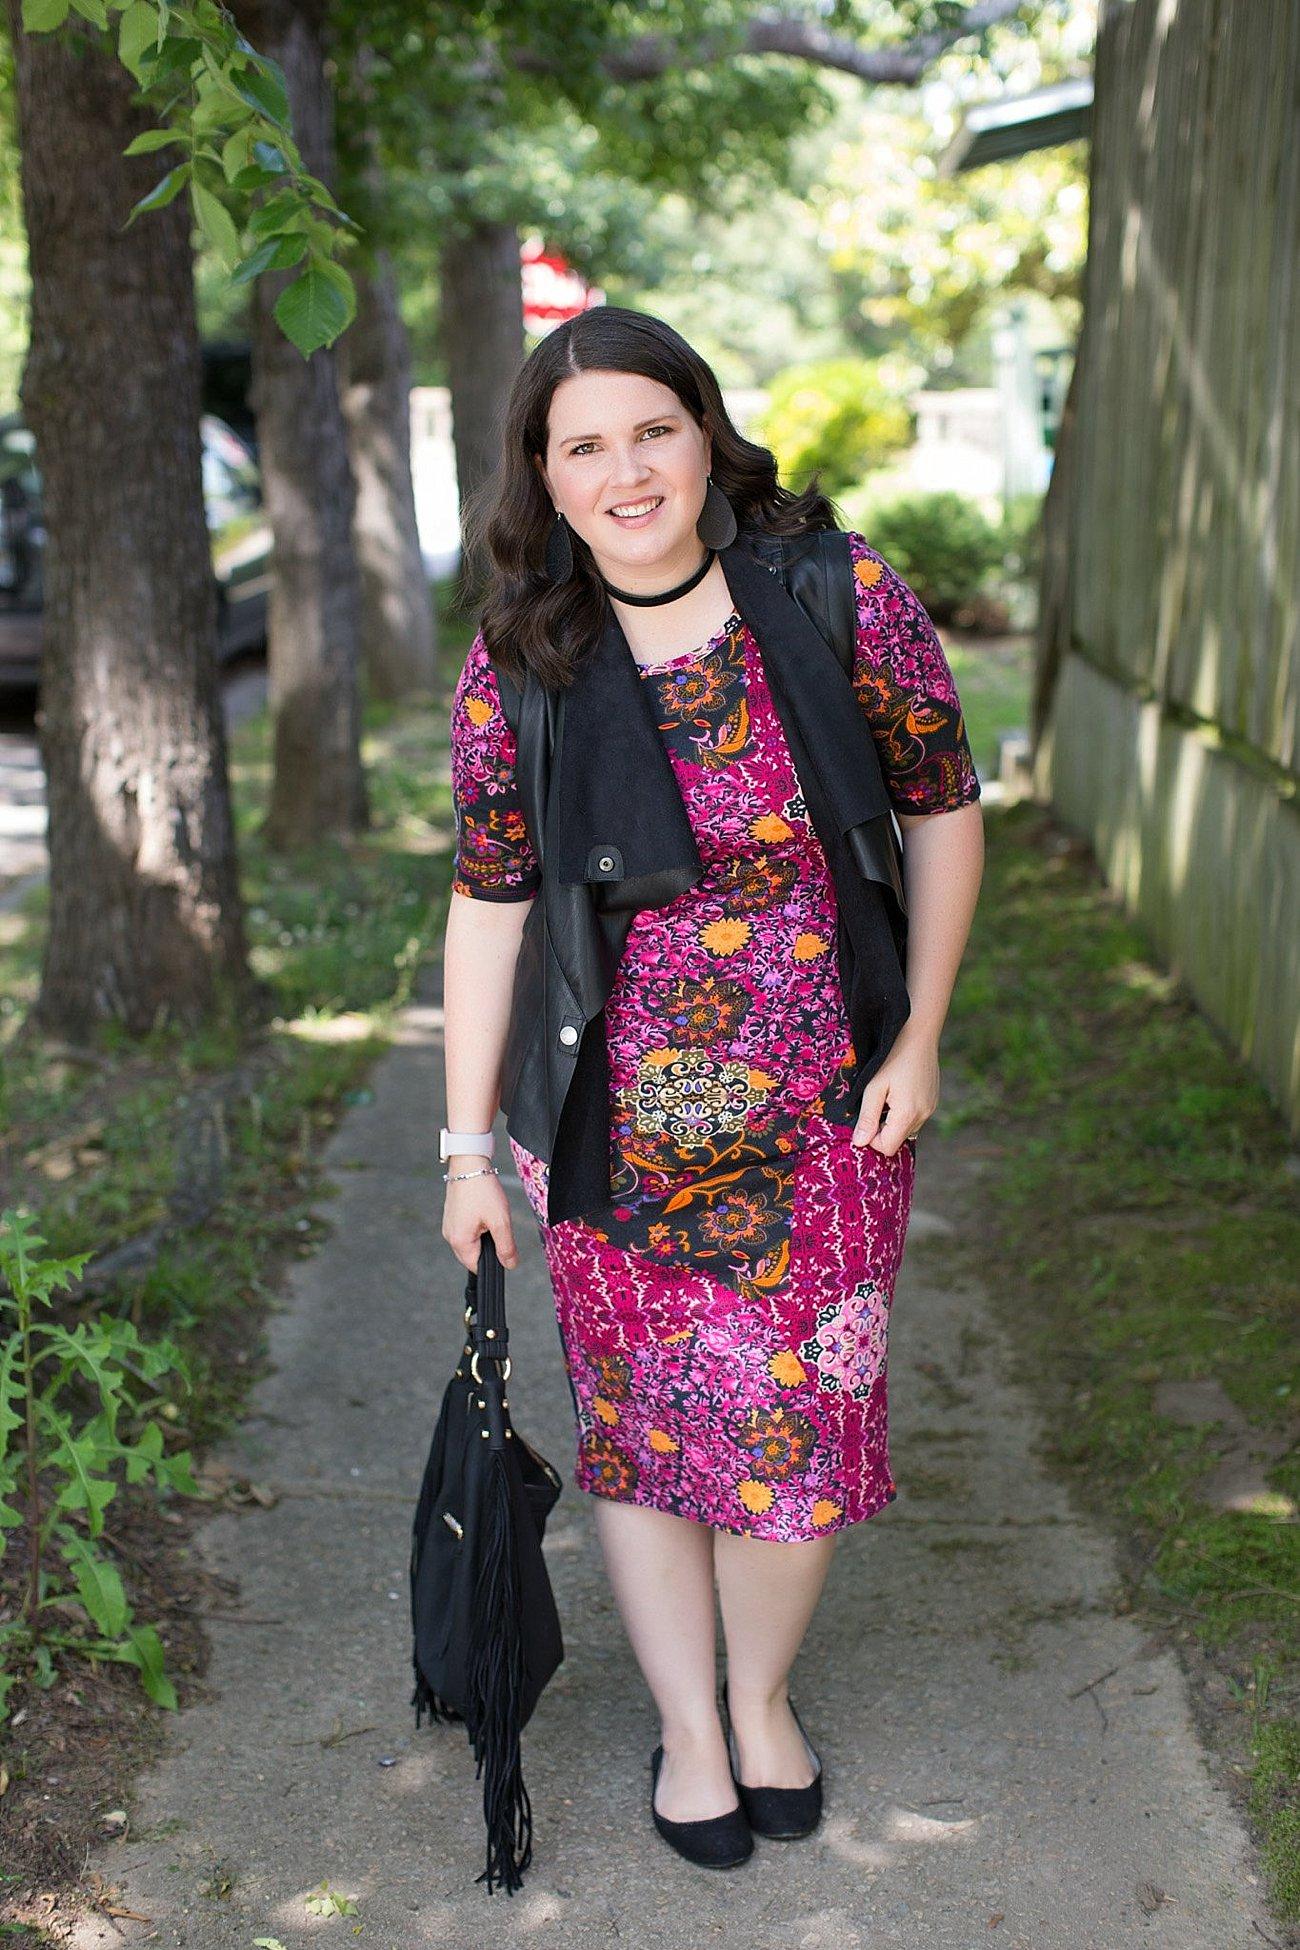 LulaRoe Julia Dress, Stitch Fix Kut From the Kloth Leather Vest, Nickel & Suede Earrings, Nickel & Suede Choker   North Carolina Fashion & Style Blogger (2)